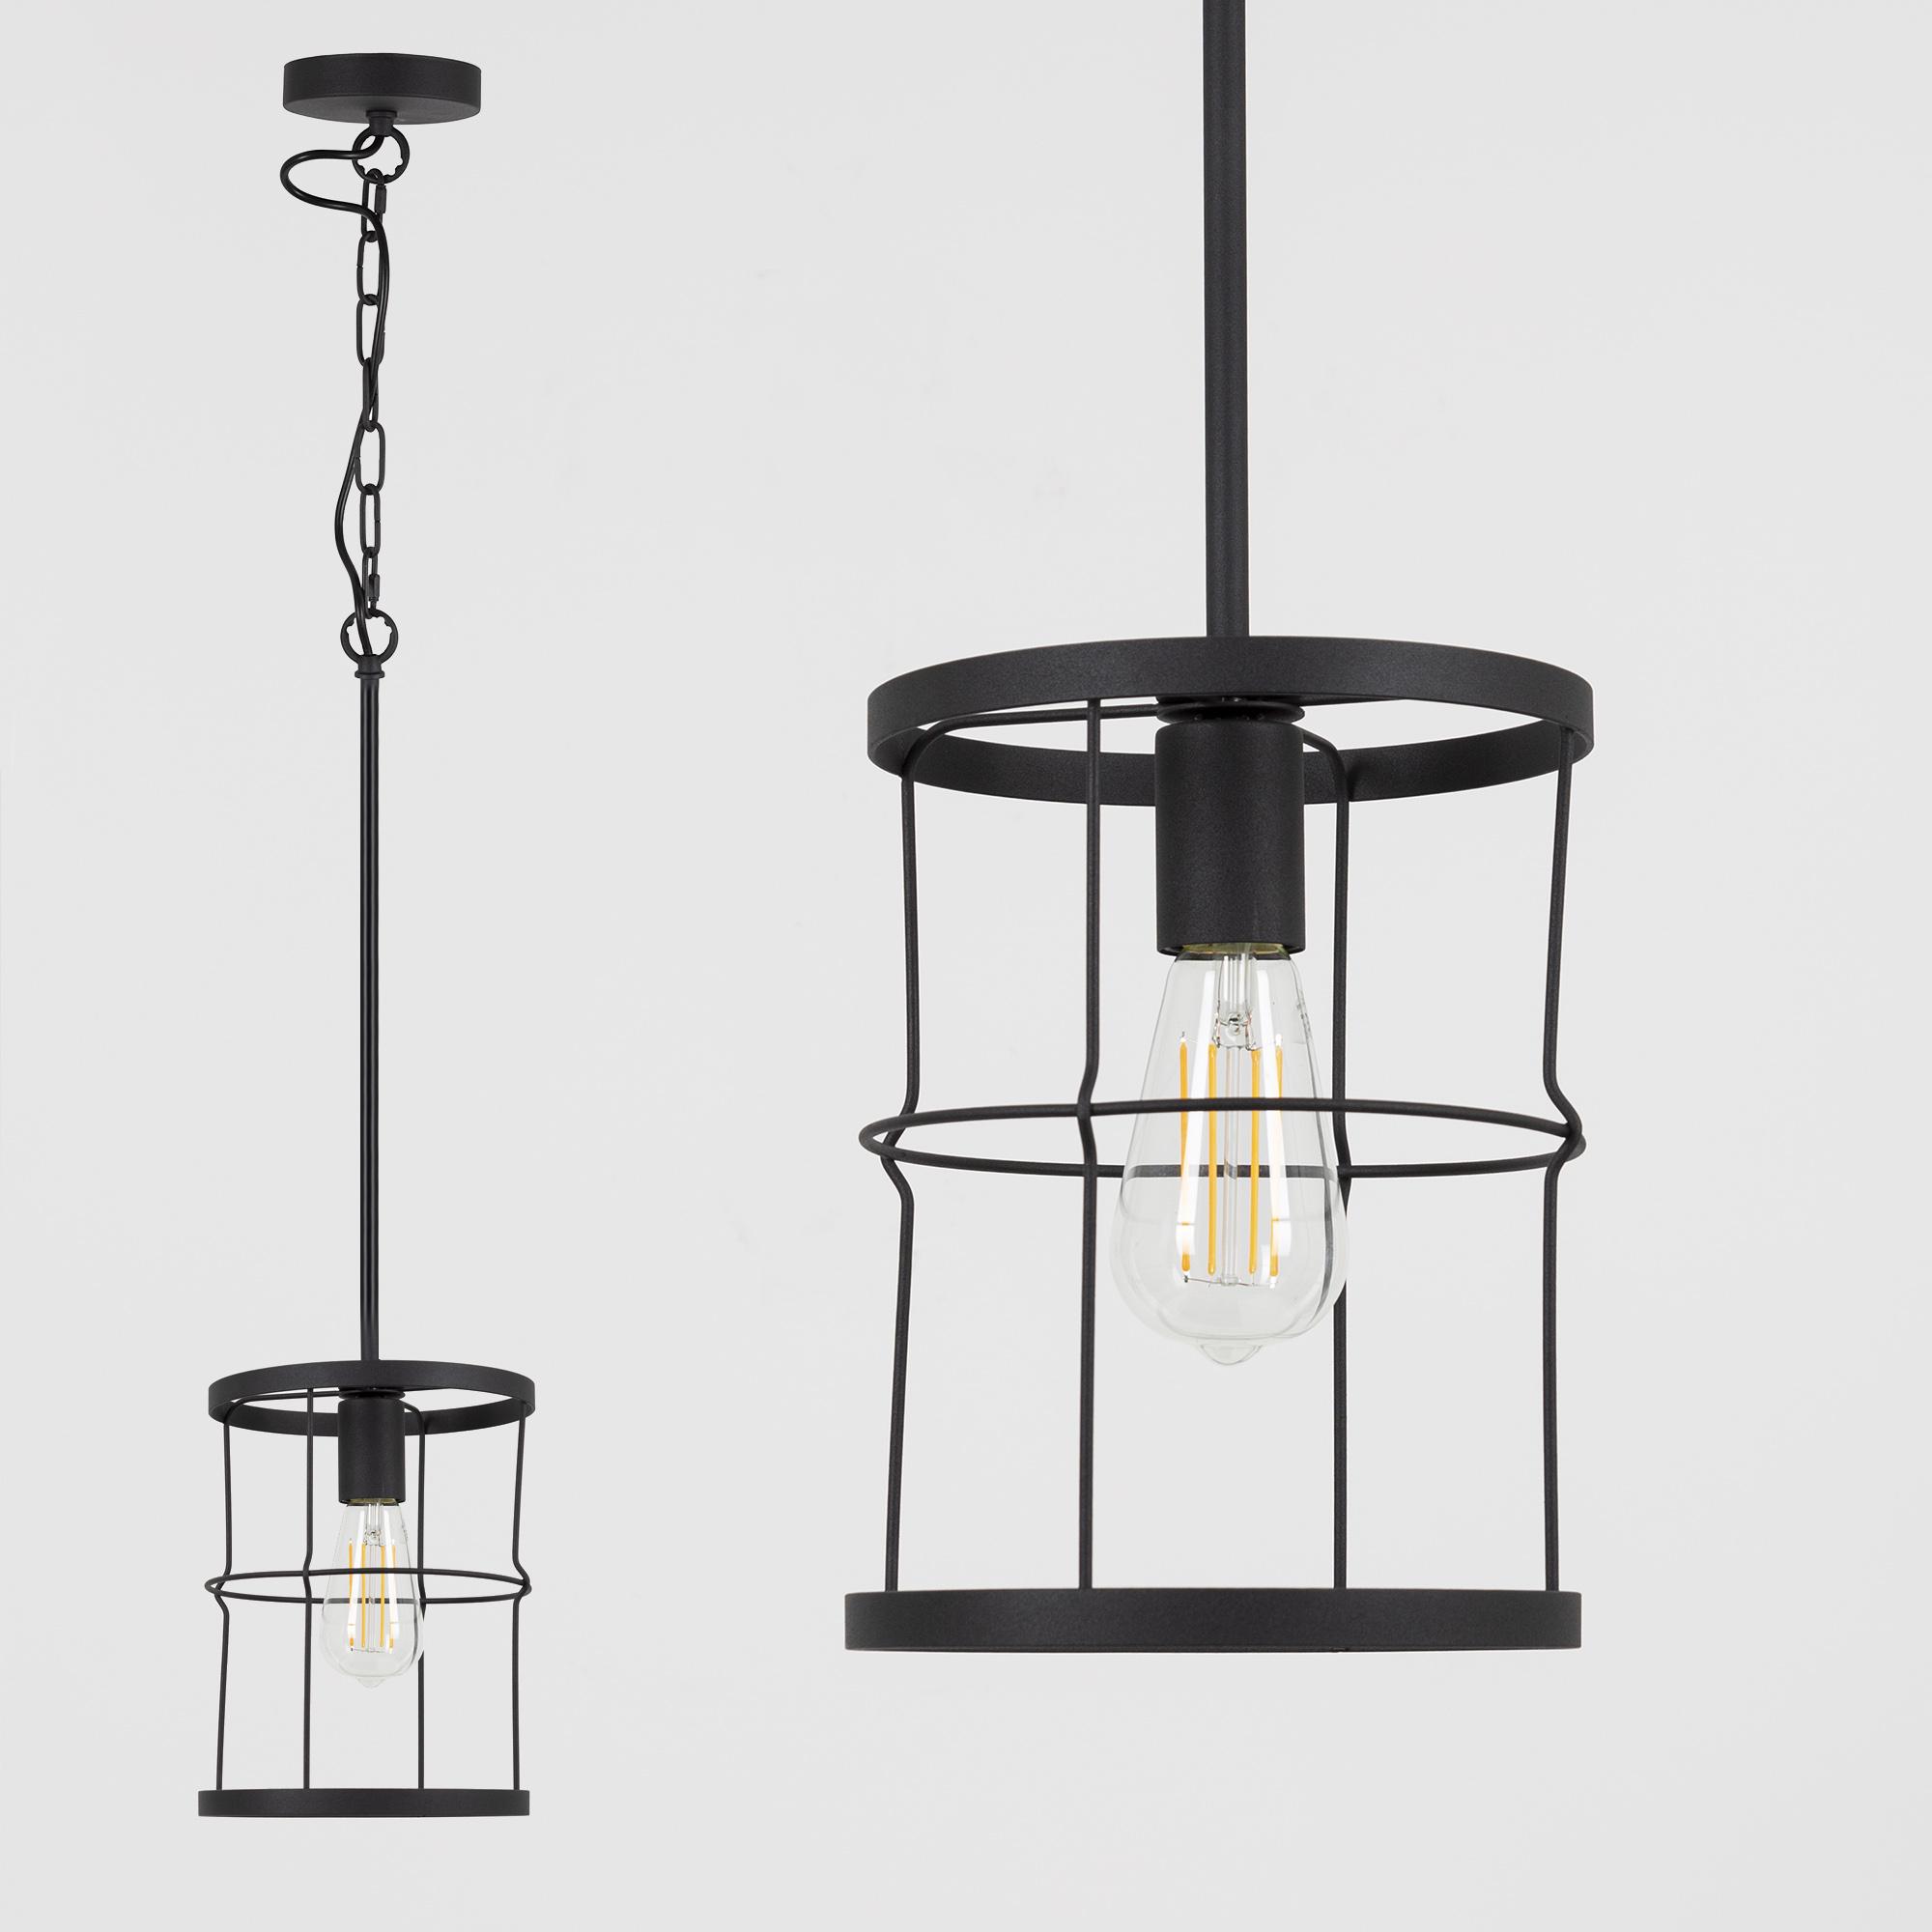 Benson hanglamp zwart